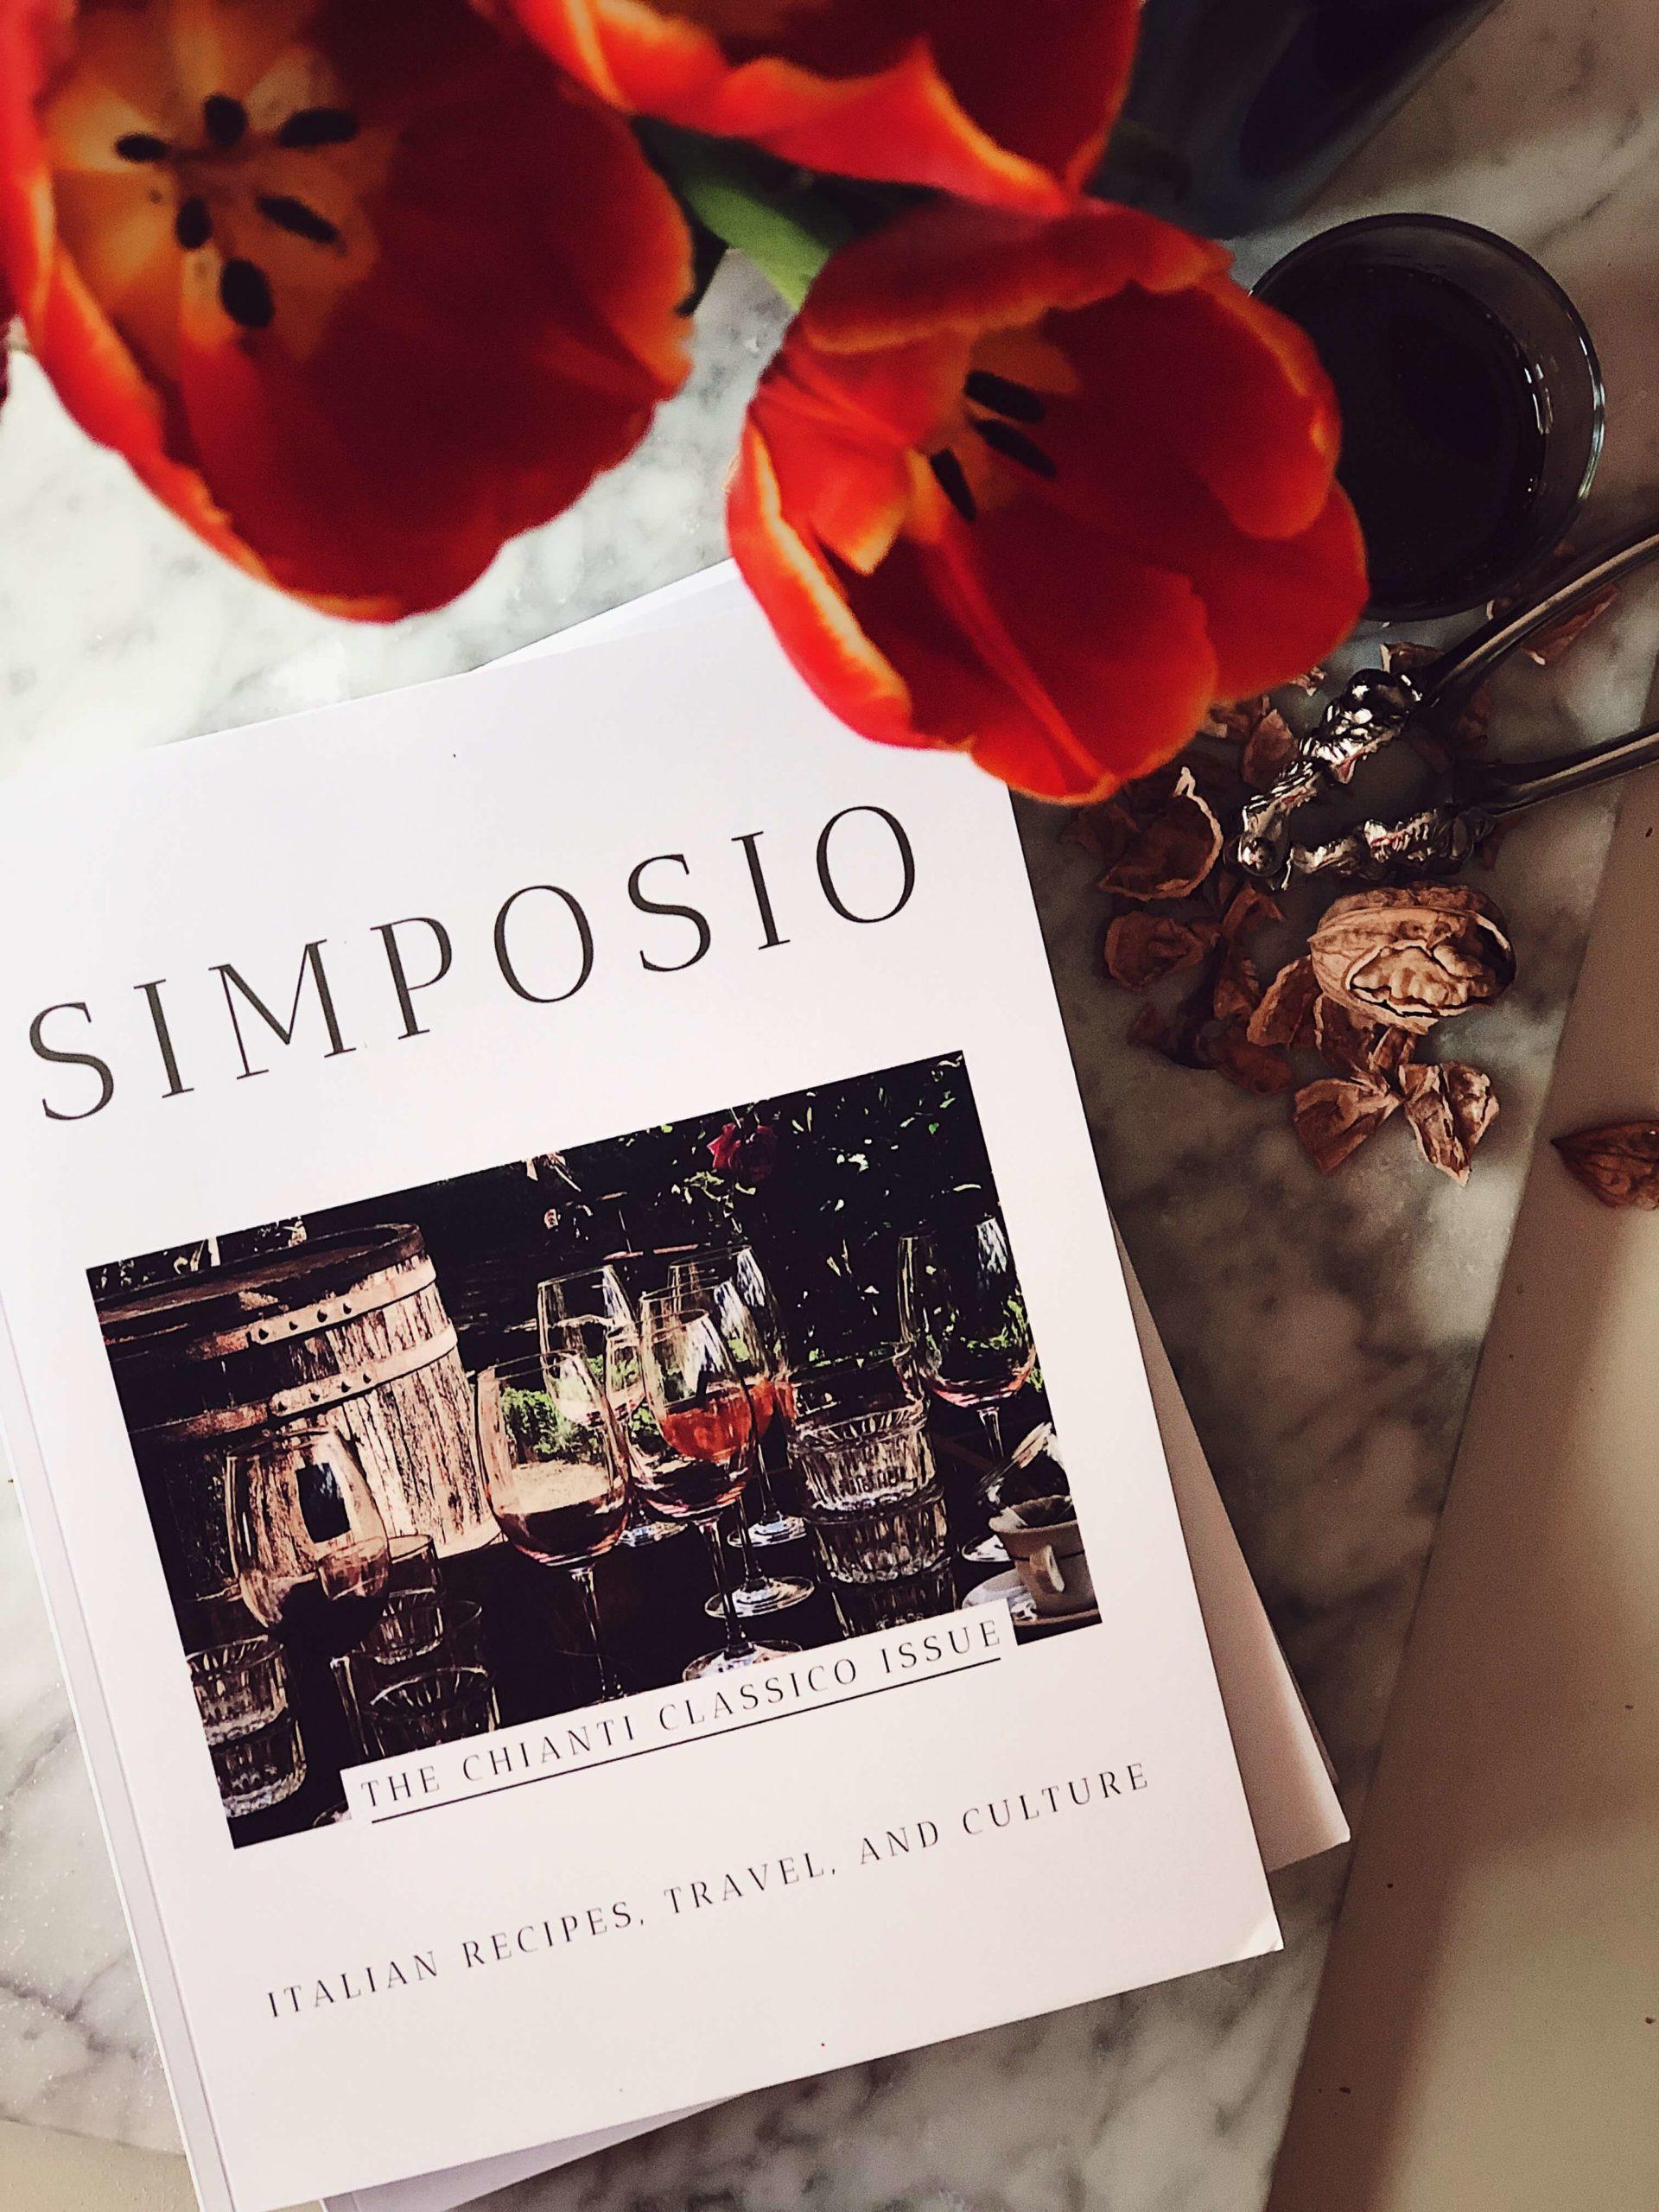 Chianti slow travel guide: The Simposio magazine issue of Chianti